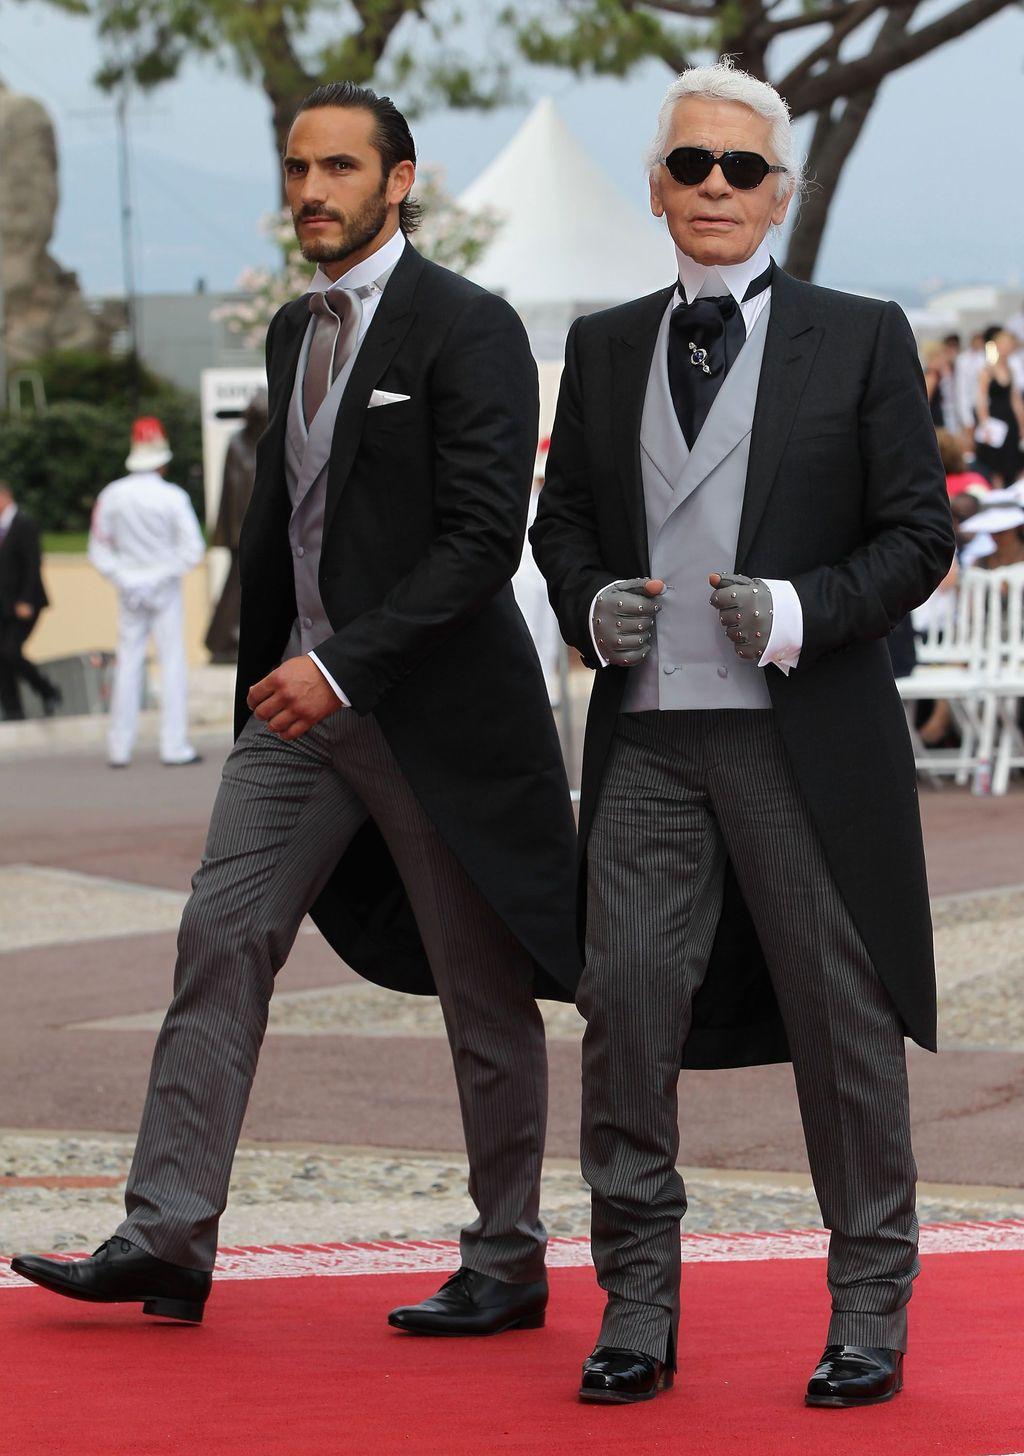 bodyguard Karl Lagerfeld jadi fashion designer